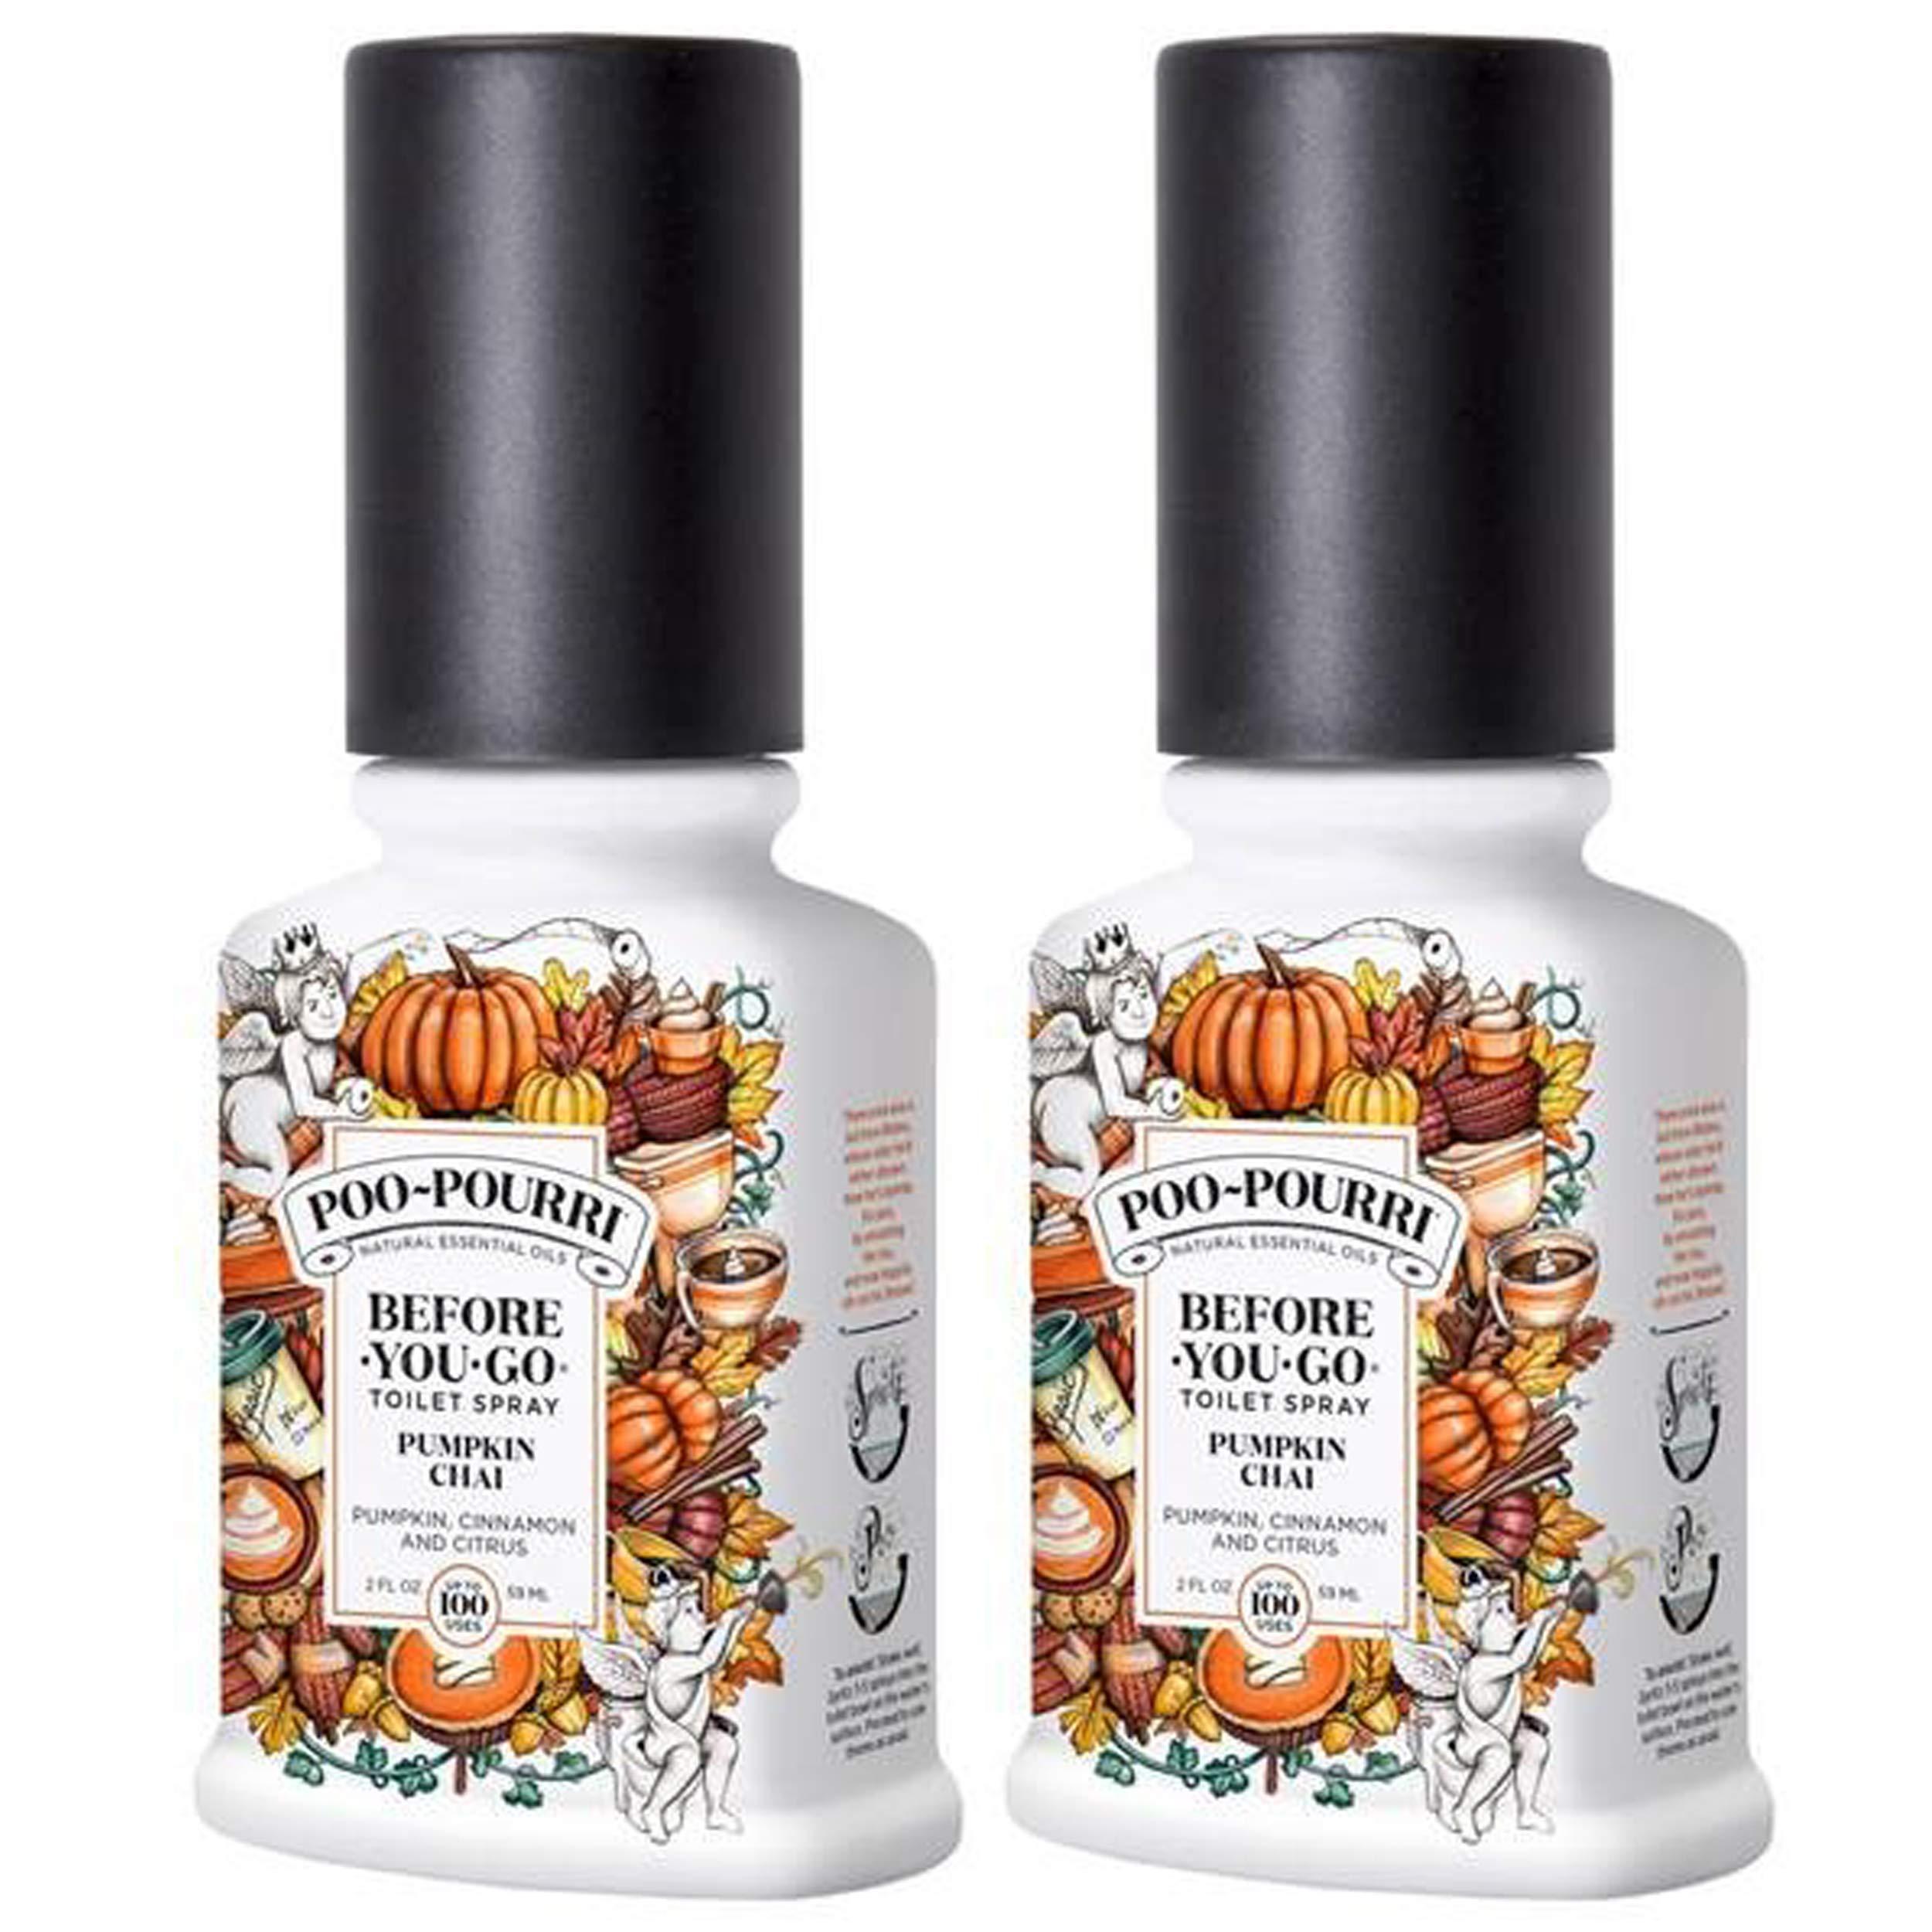 Poo-Pourri Before You Go Toilet Spray Pumpkin Chai 2 Ounce, 2 Pack by Poo-Pourri